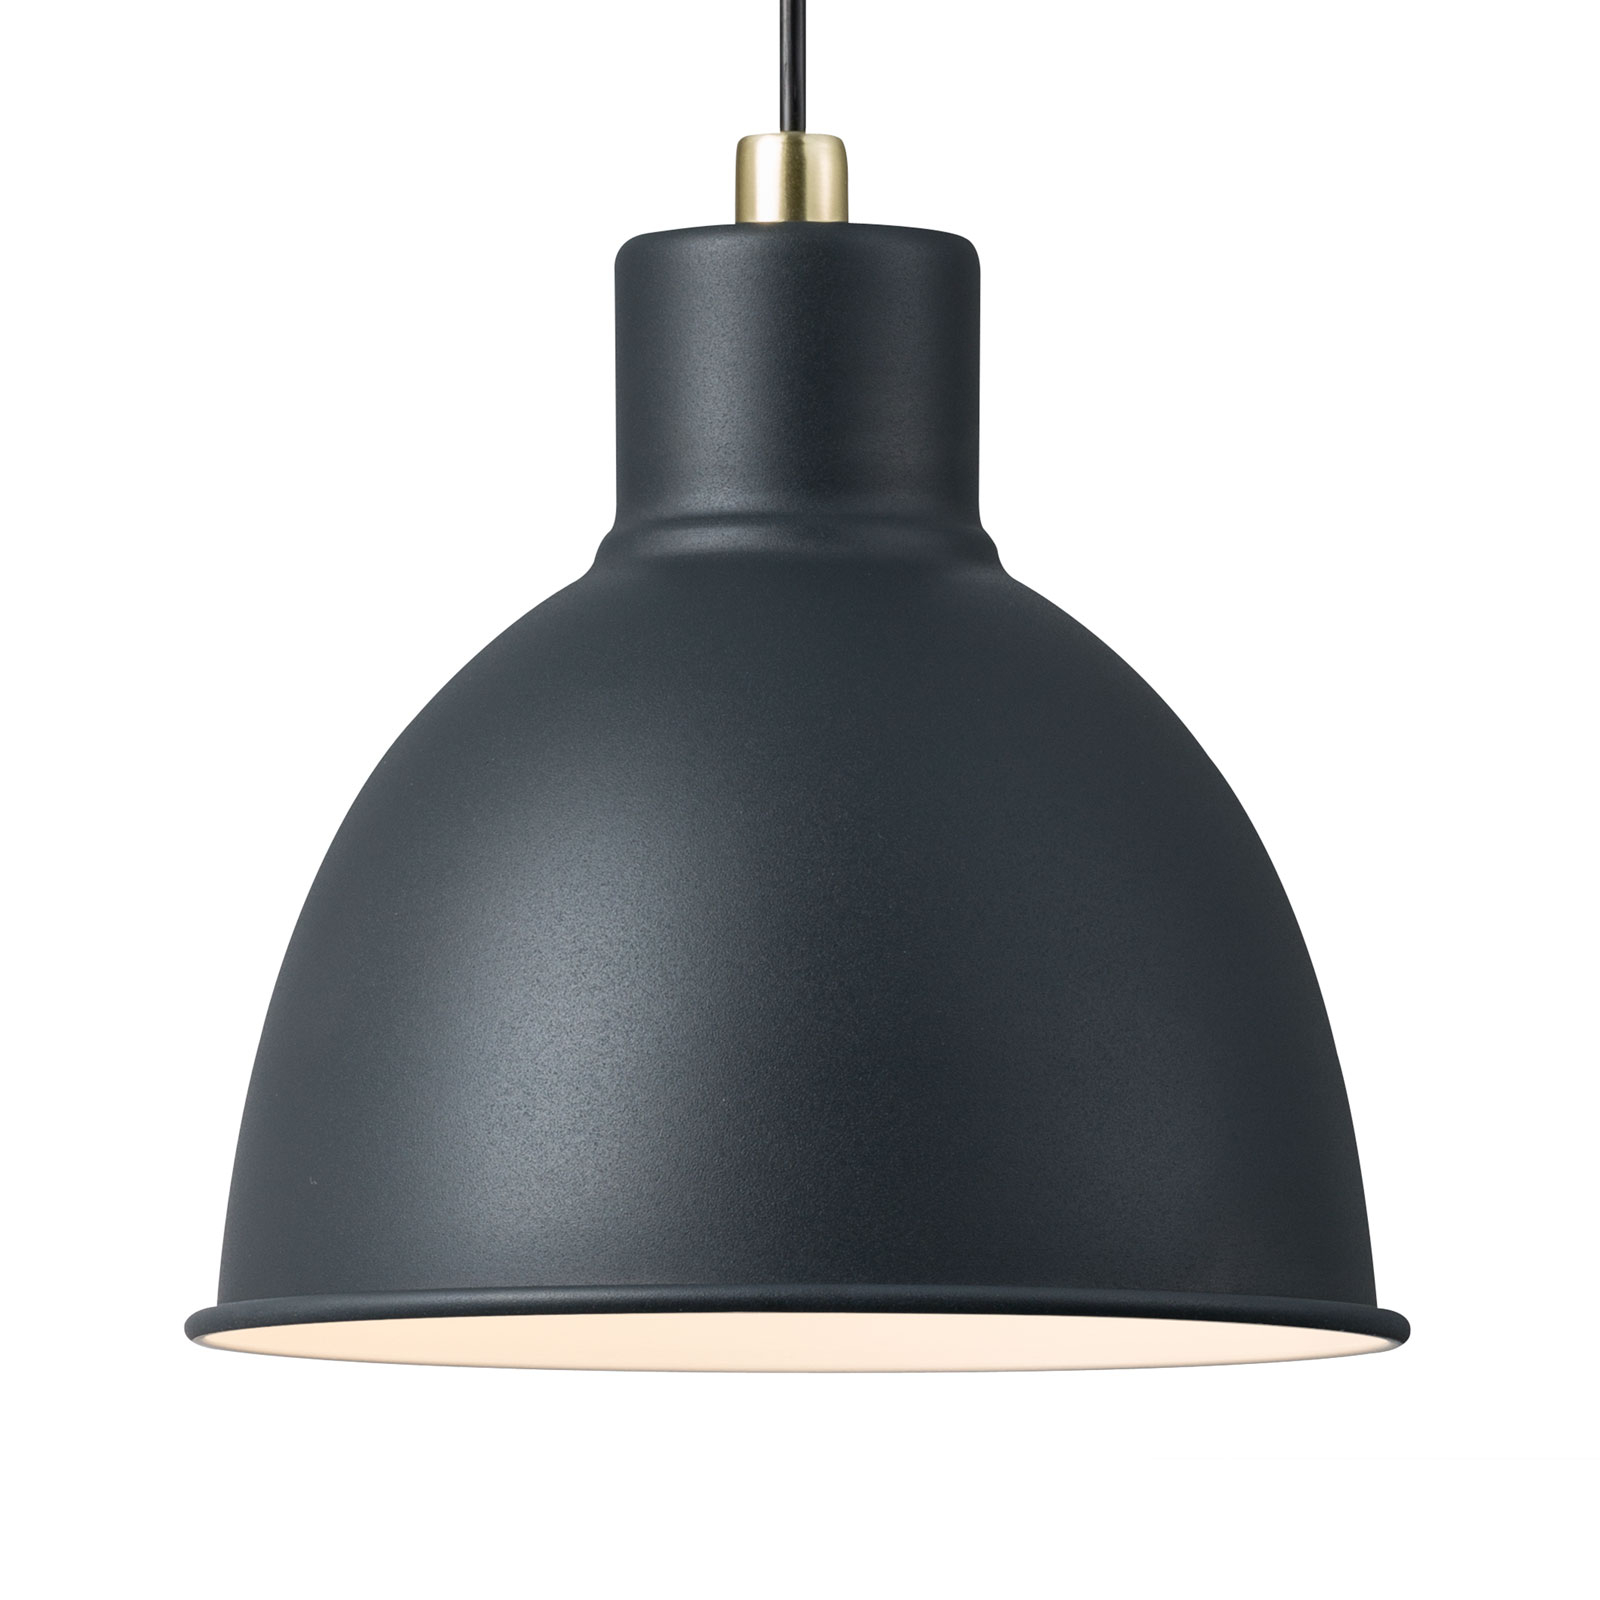 Lampa wisząca Pop Rough z metalu, czarna